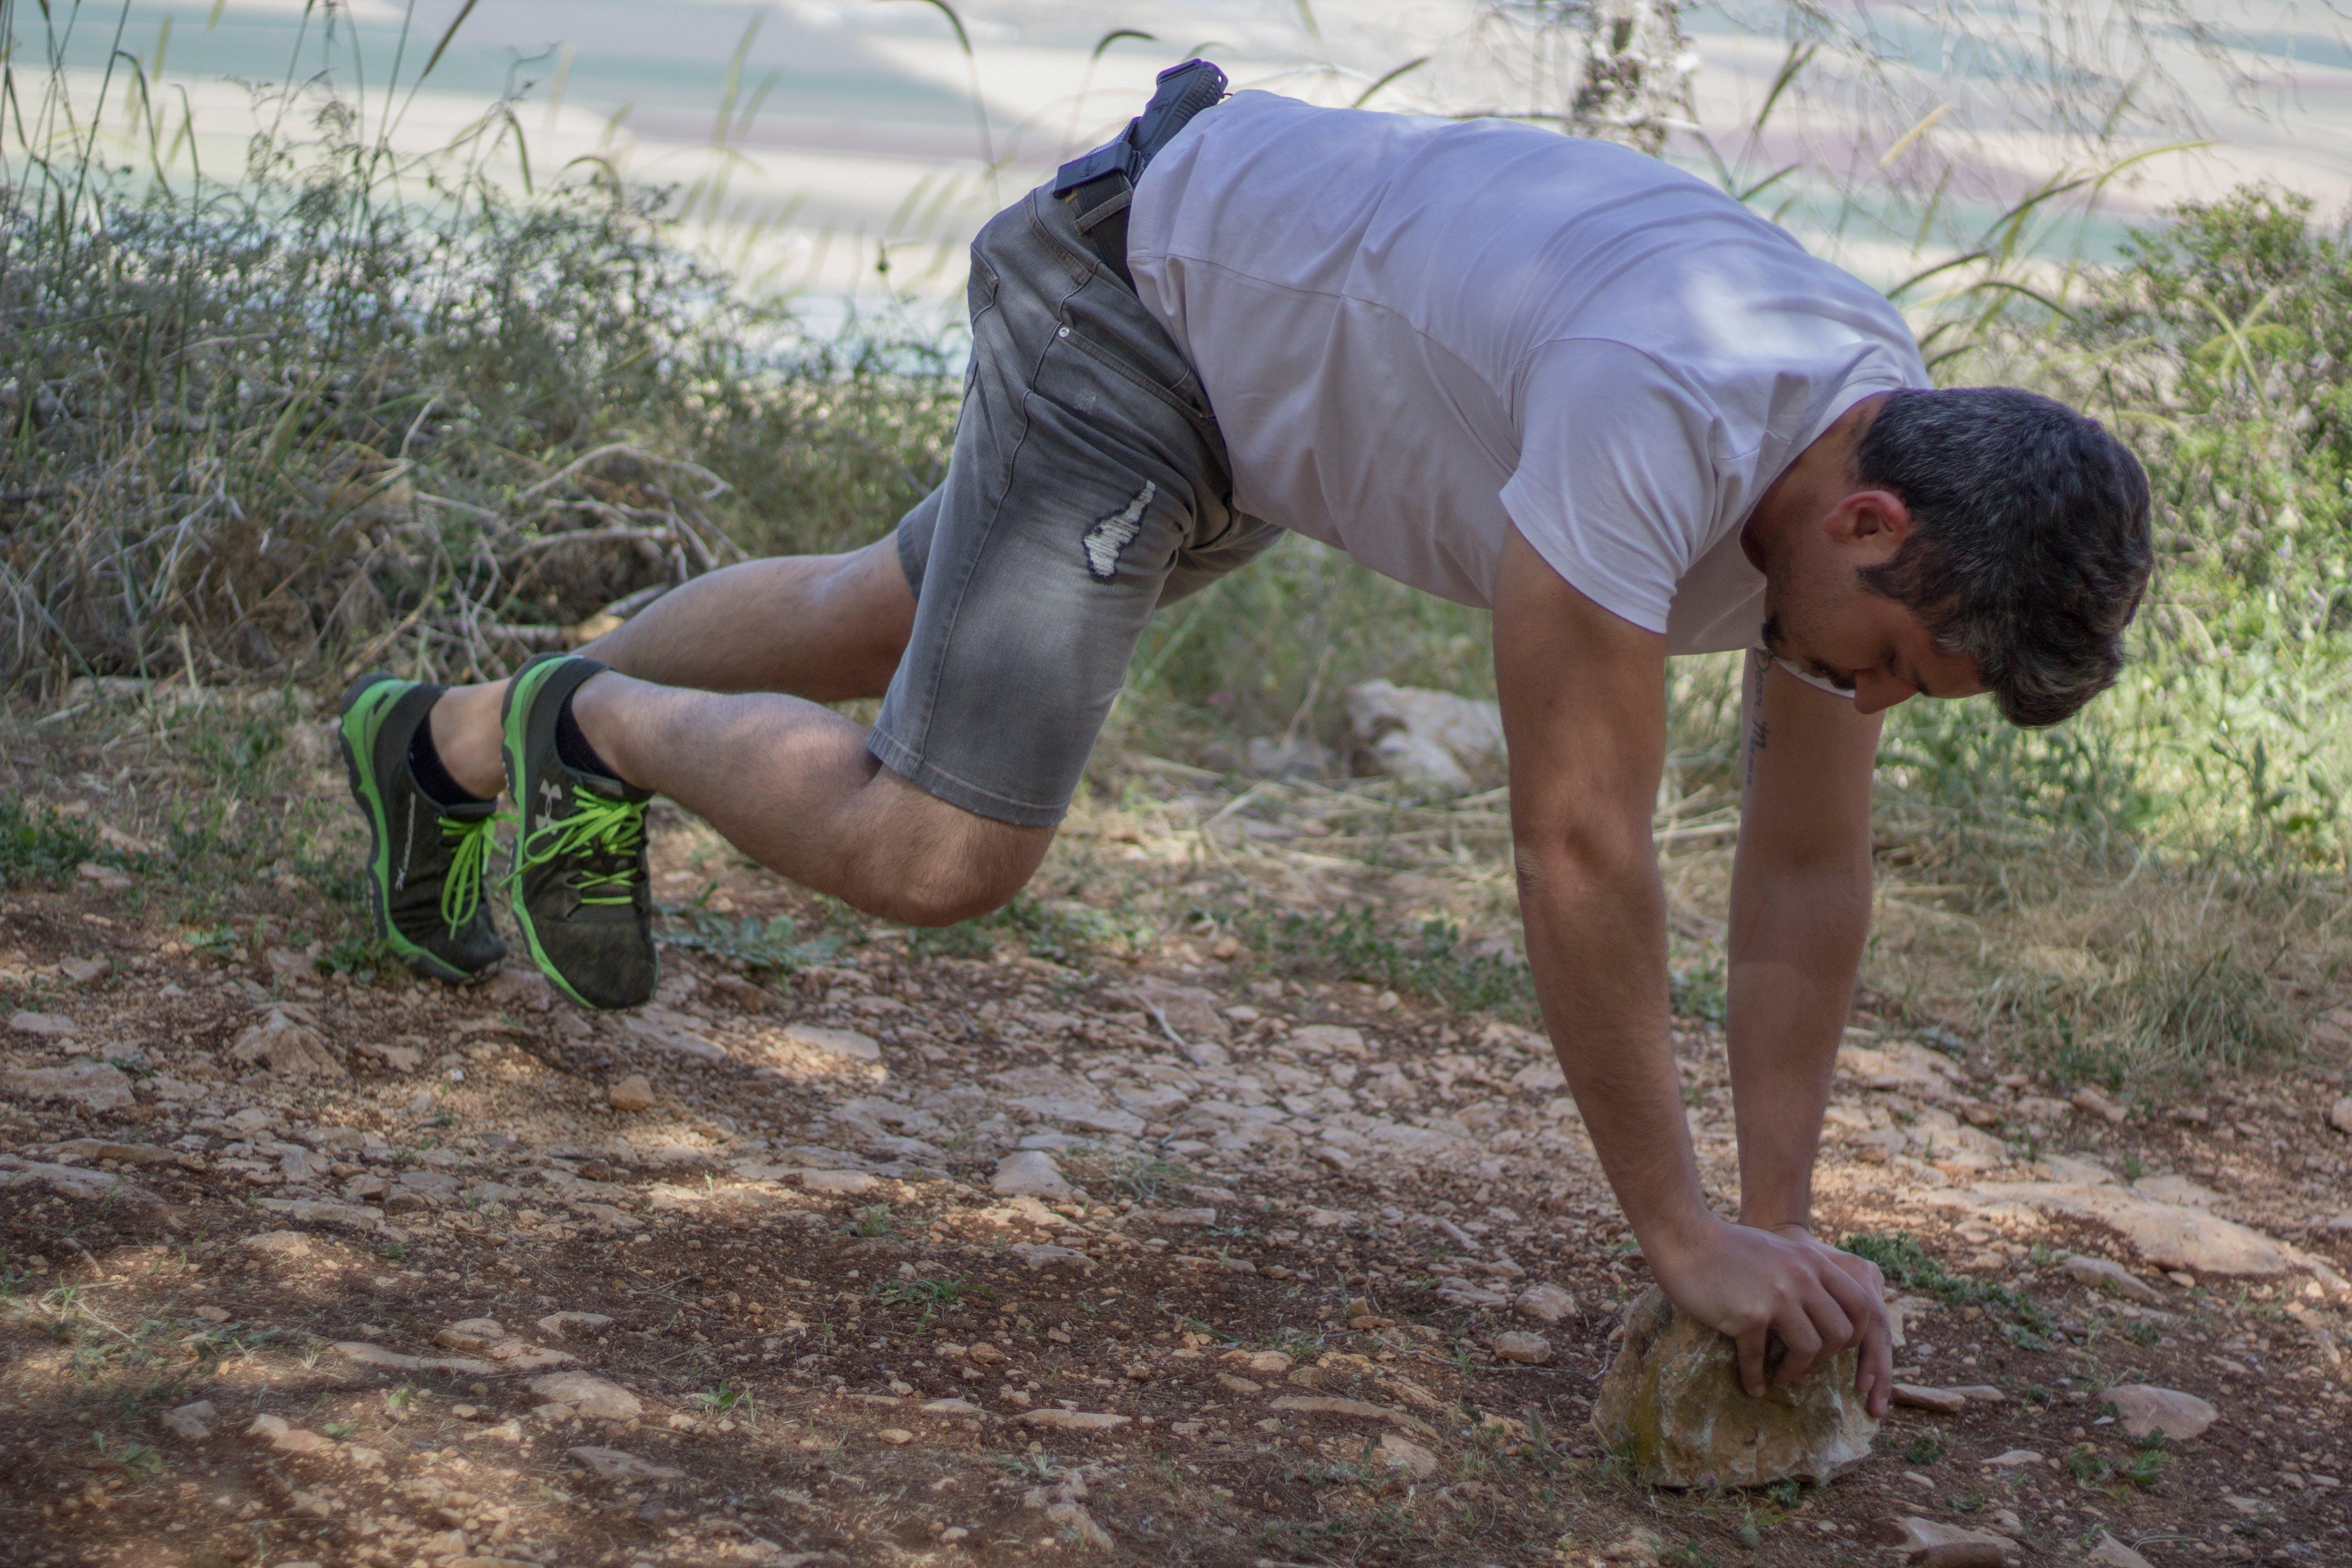 Gratis arkivbilde med bodybuilding, hage, idf, Israel